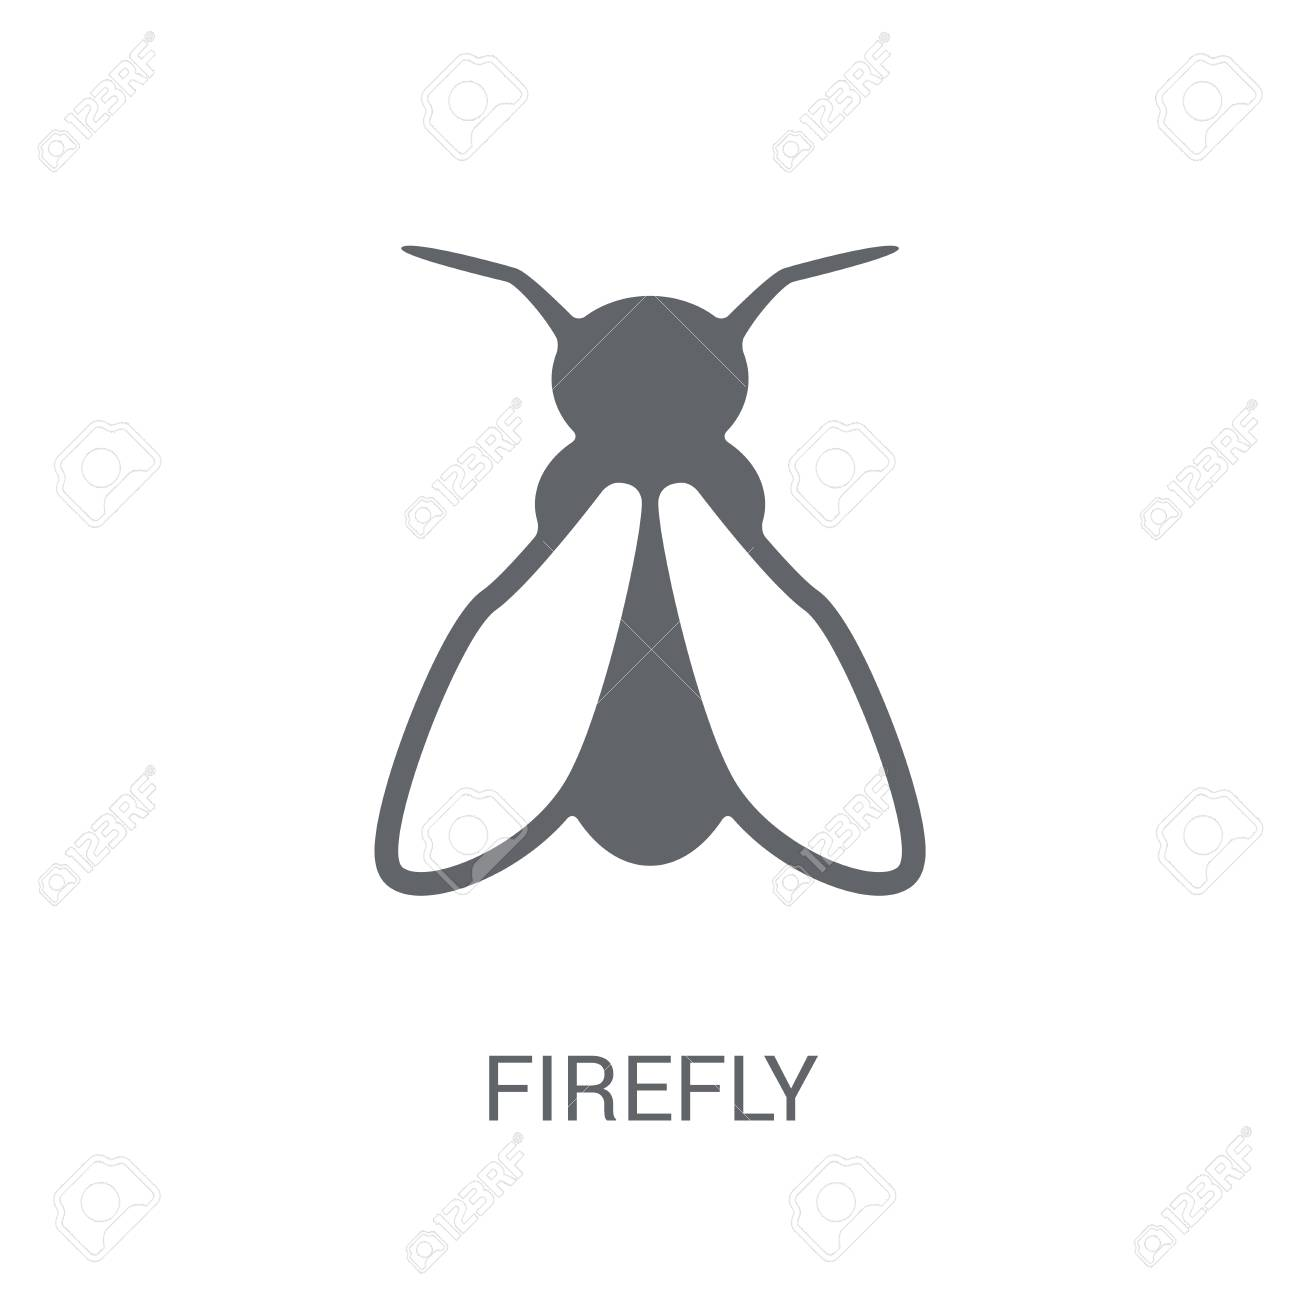 Printable Firefly Stencil Wwwtopsimagescom